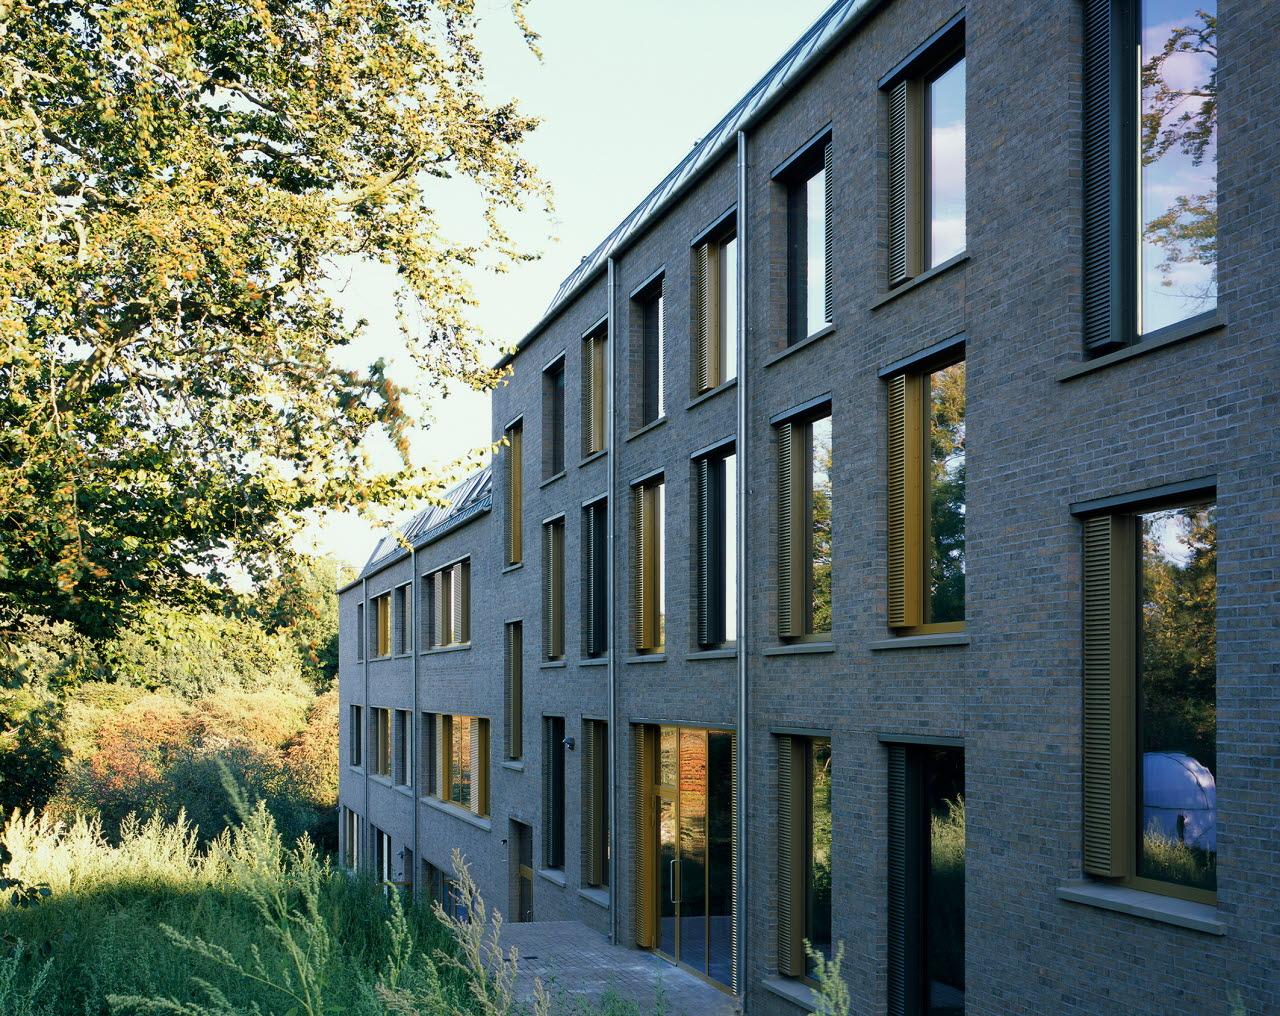 SE Sevenoaks_Tim Ronalds Architects_credit Helene Binet.jpg